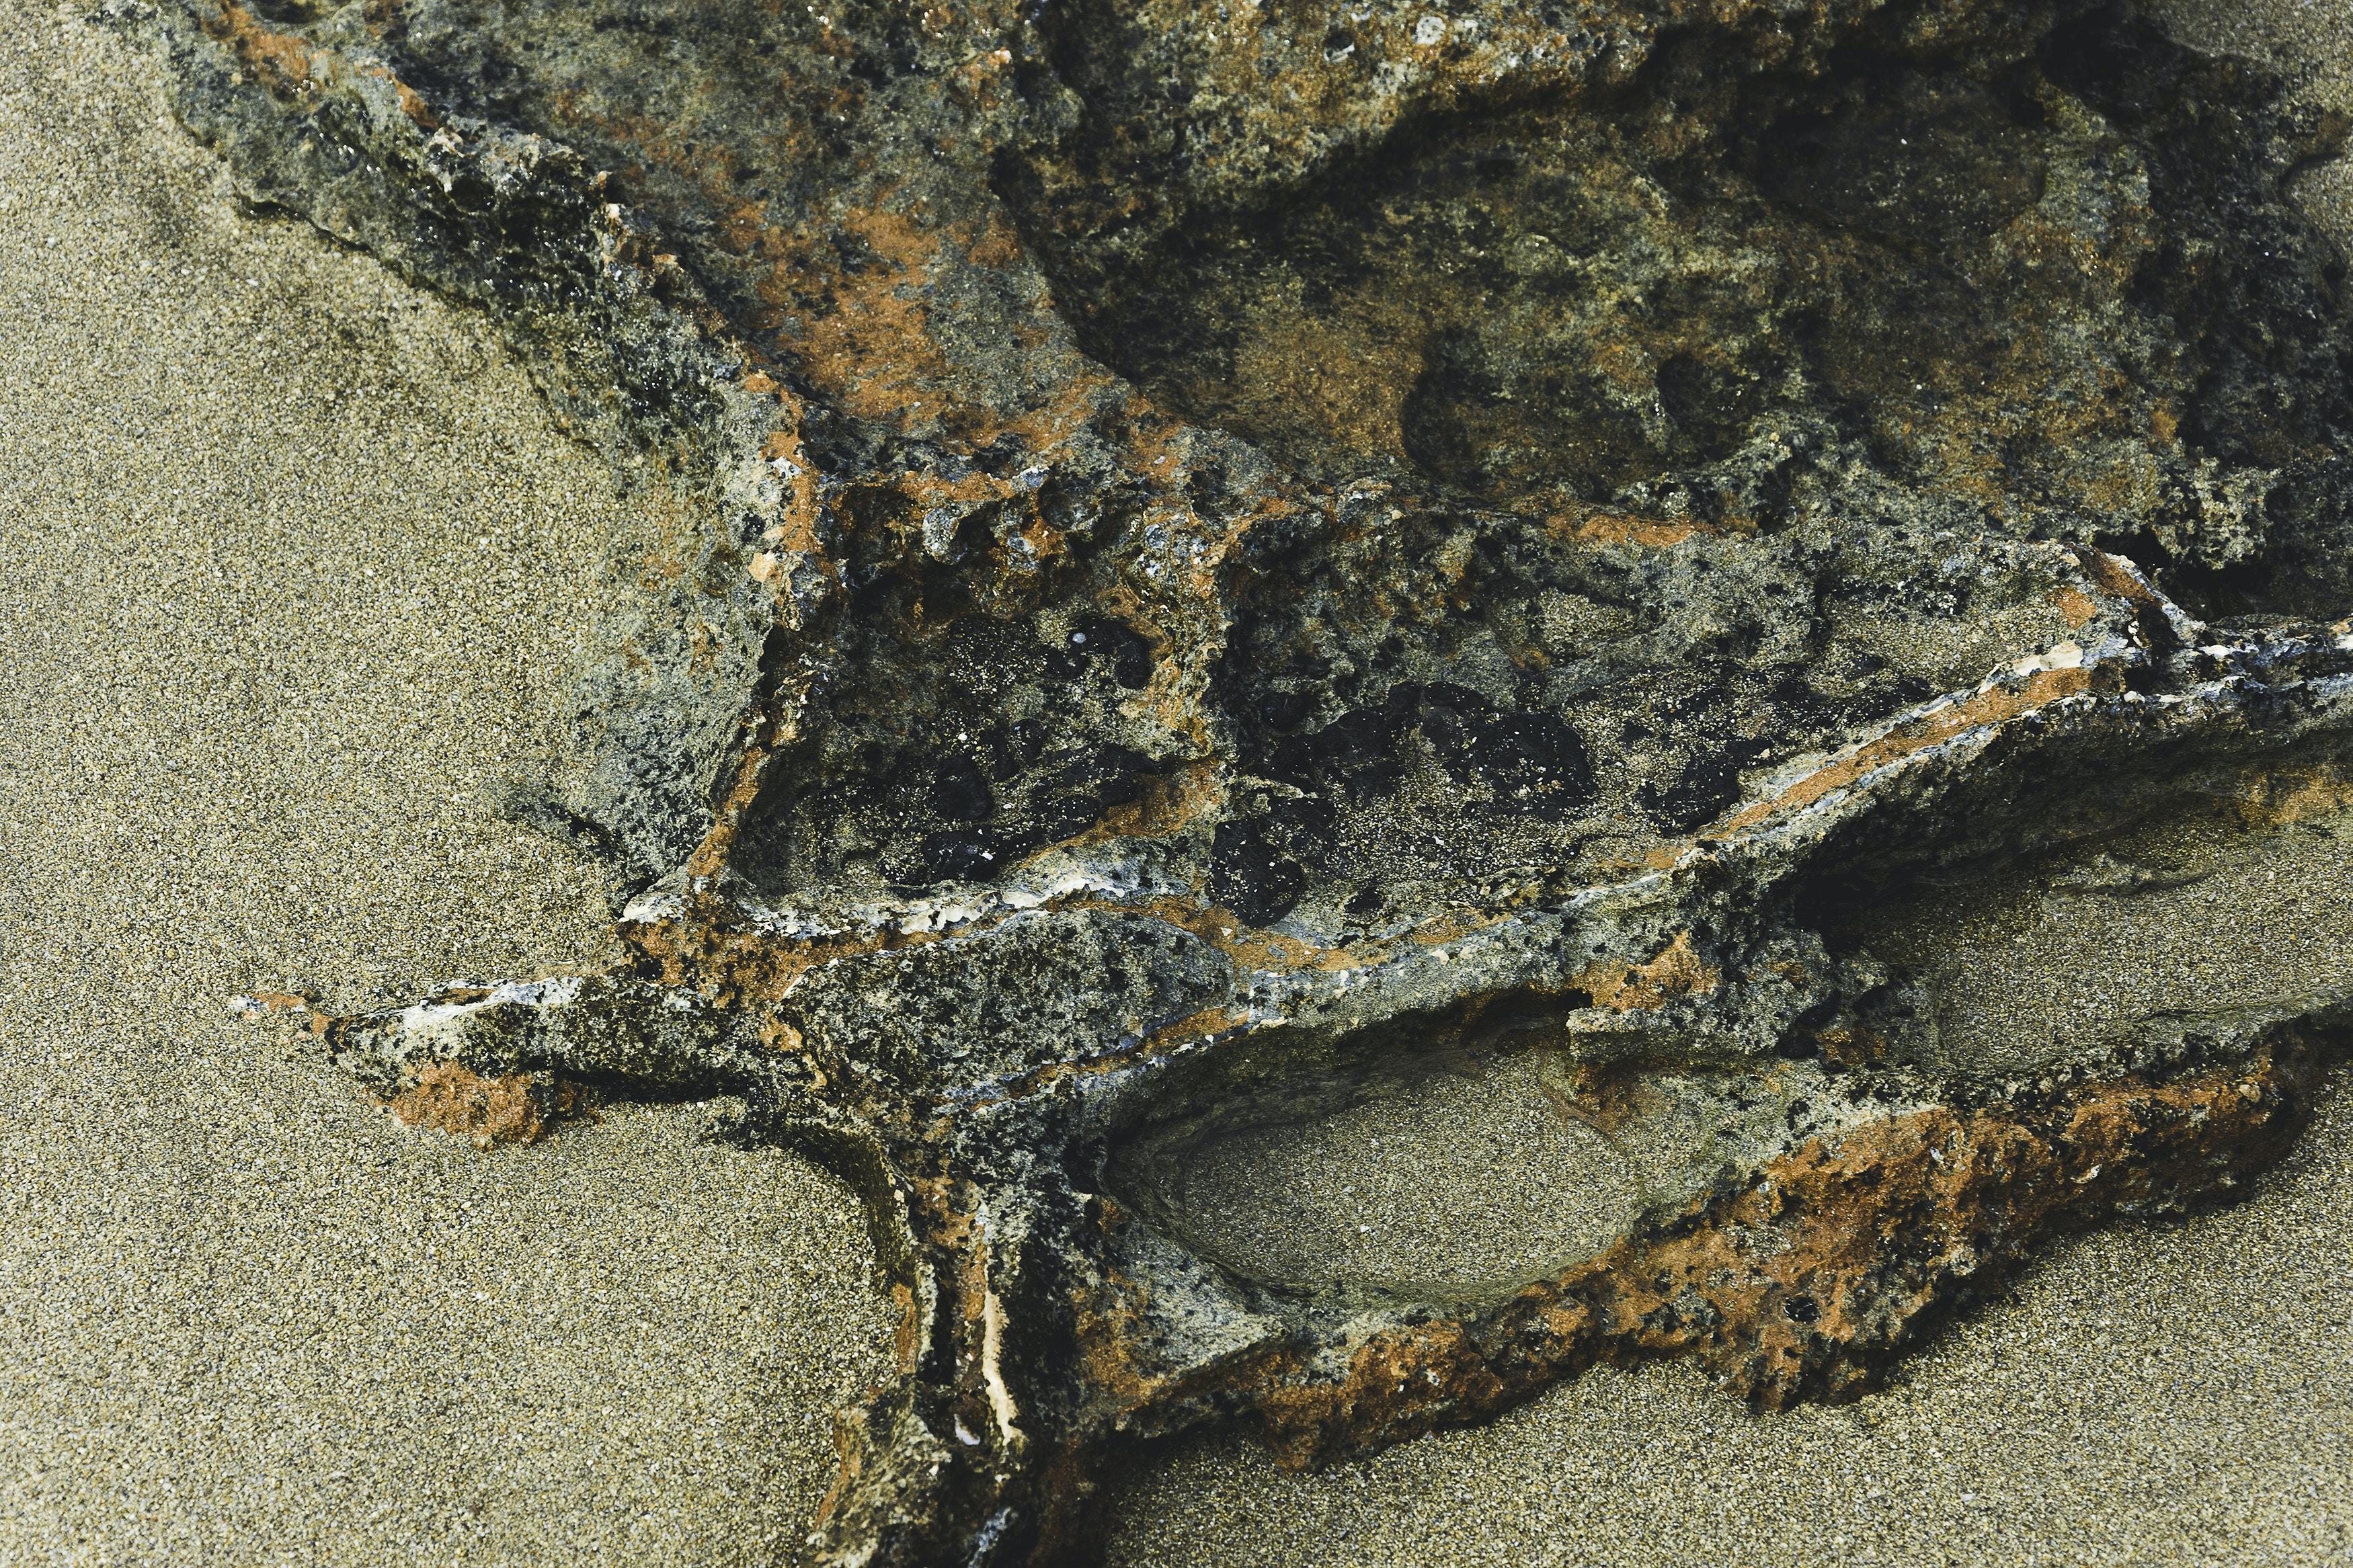 gray stone fragment